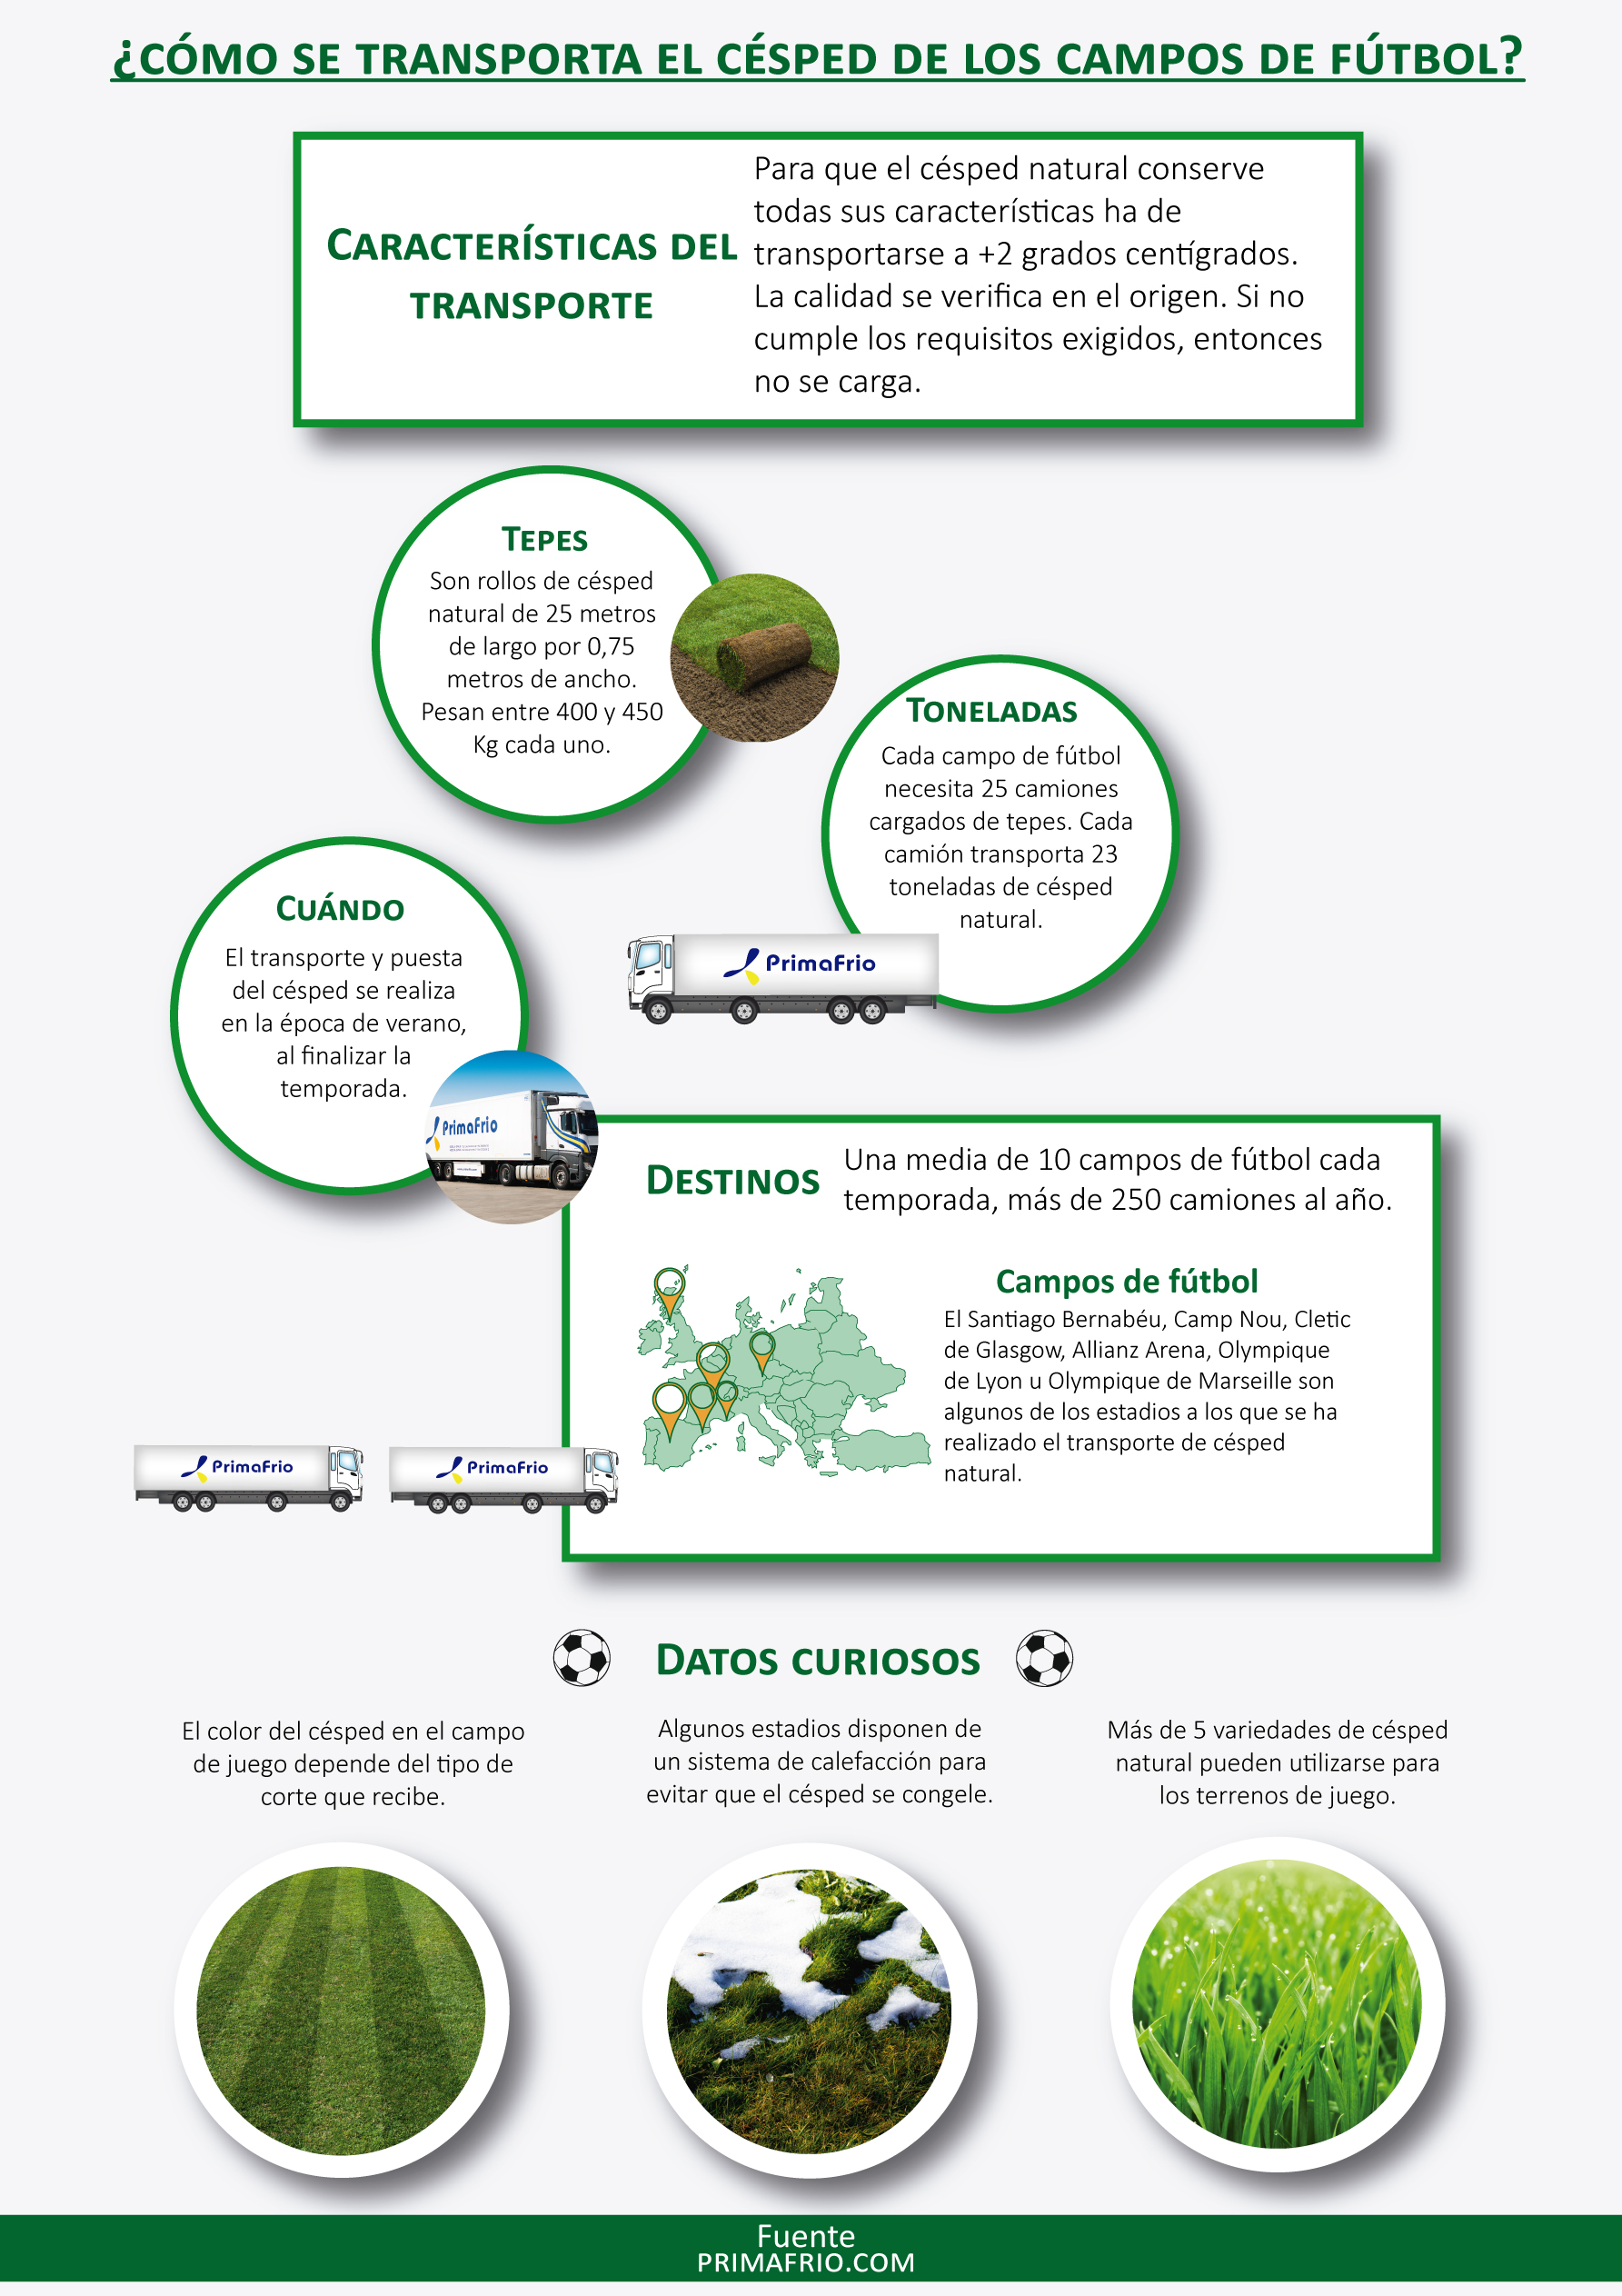 Primafrio transporte cesped campos de futbol